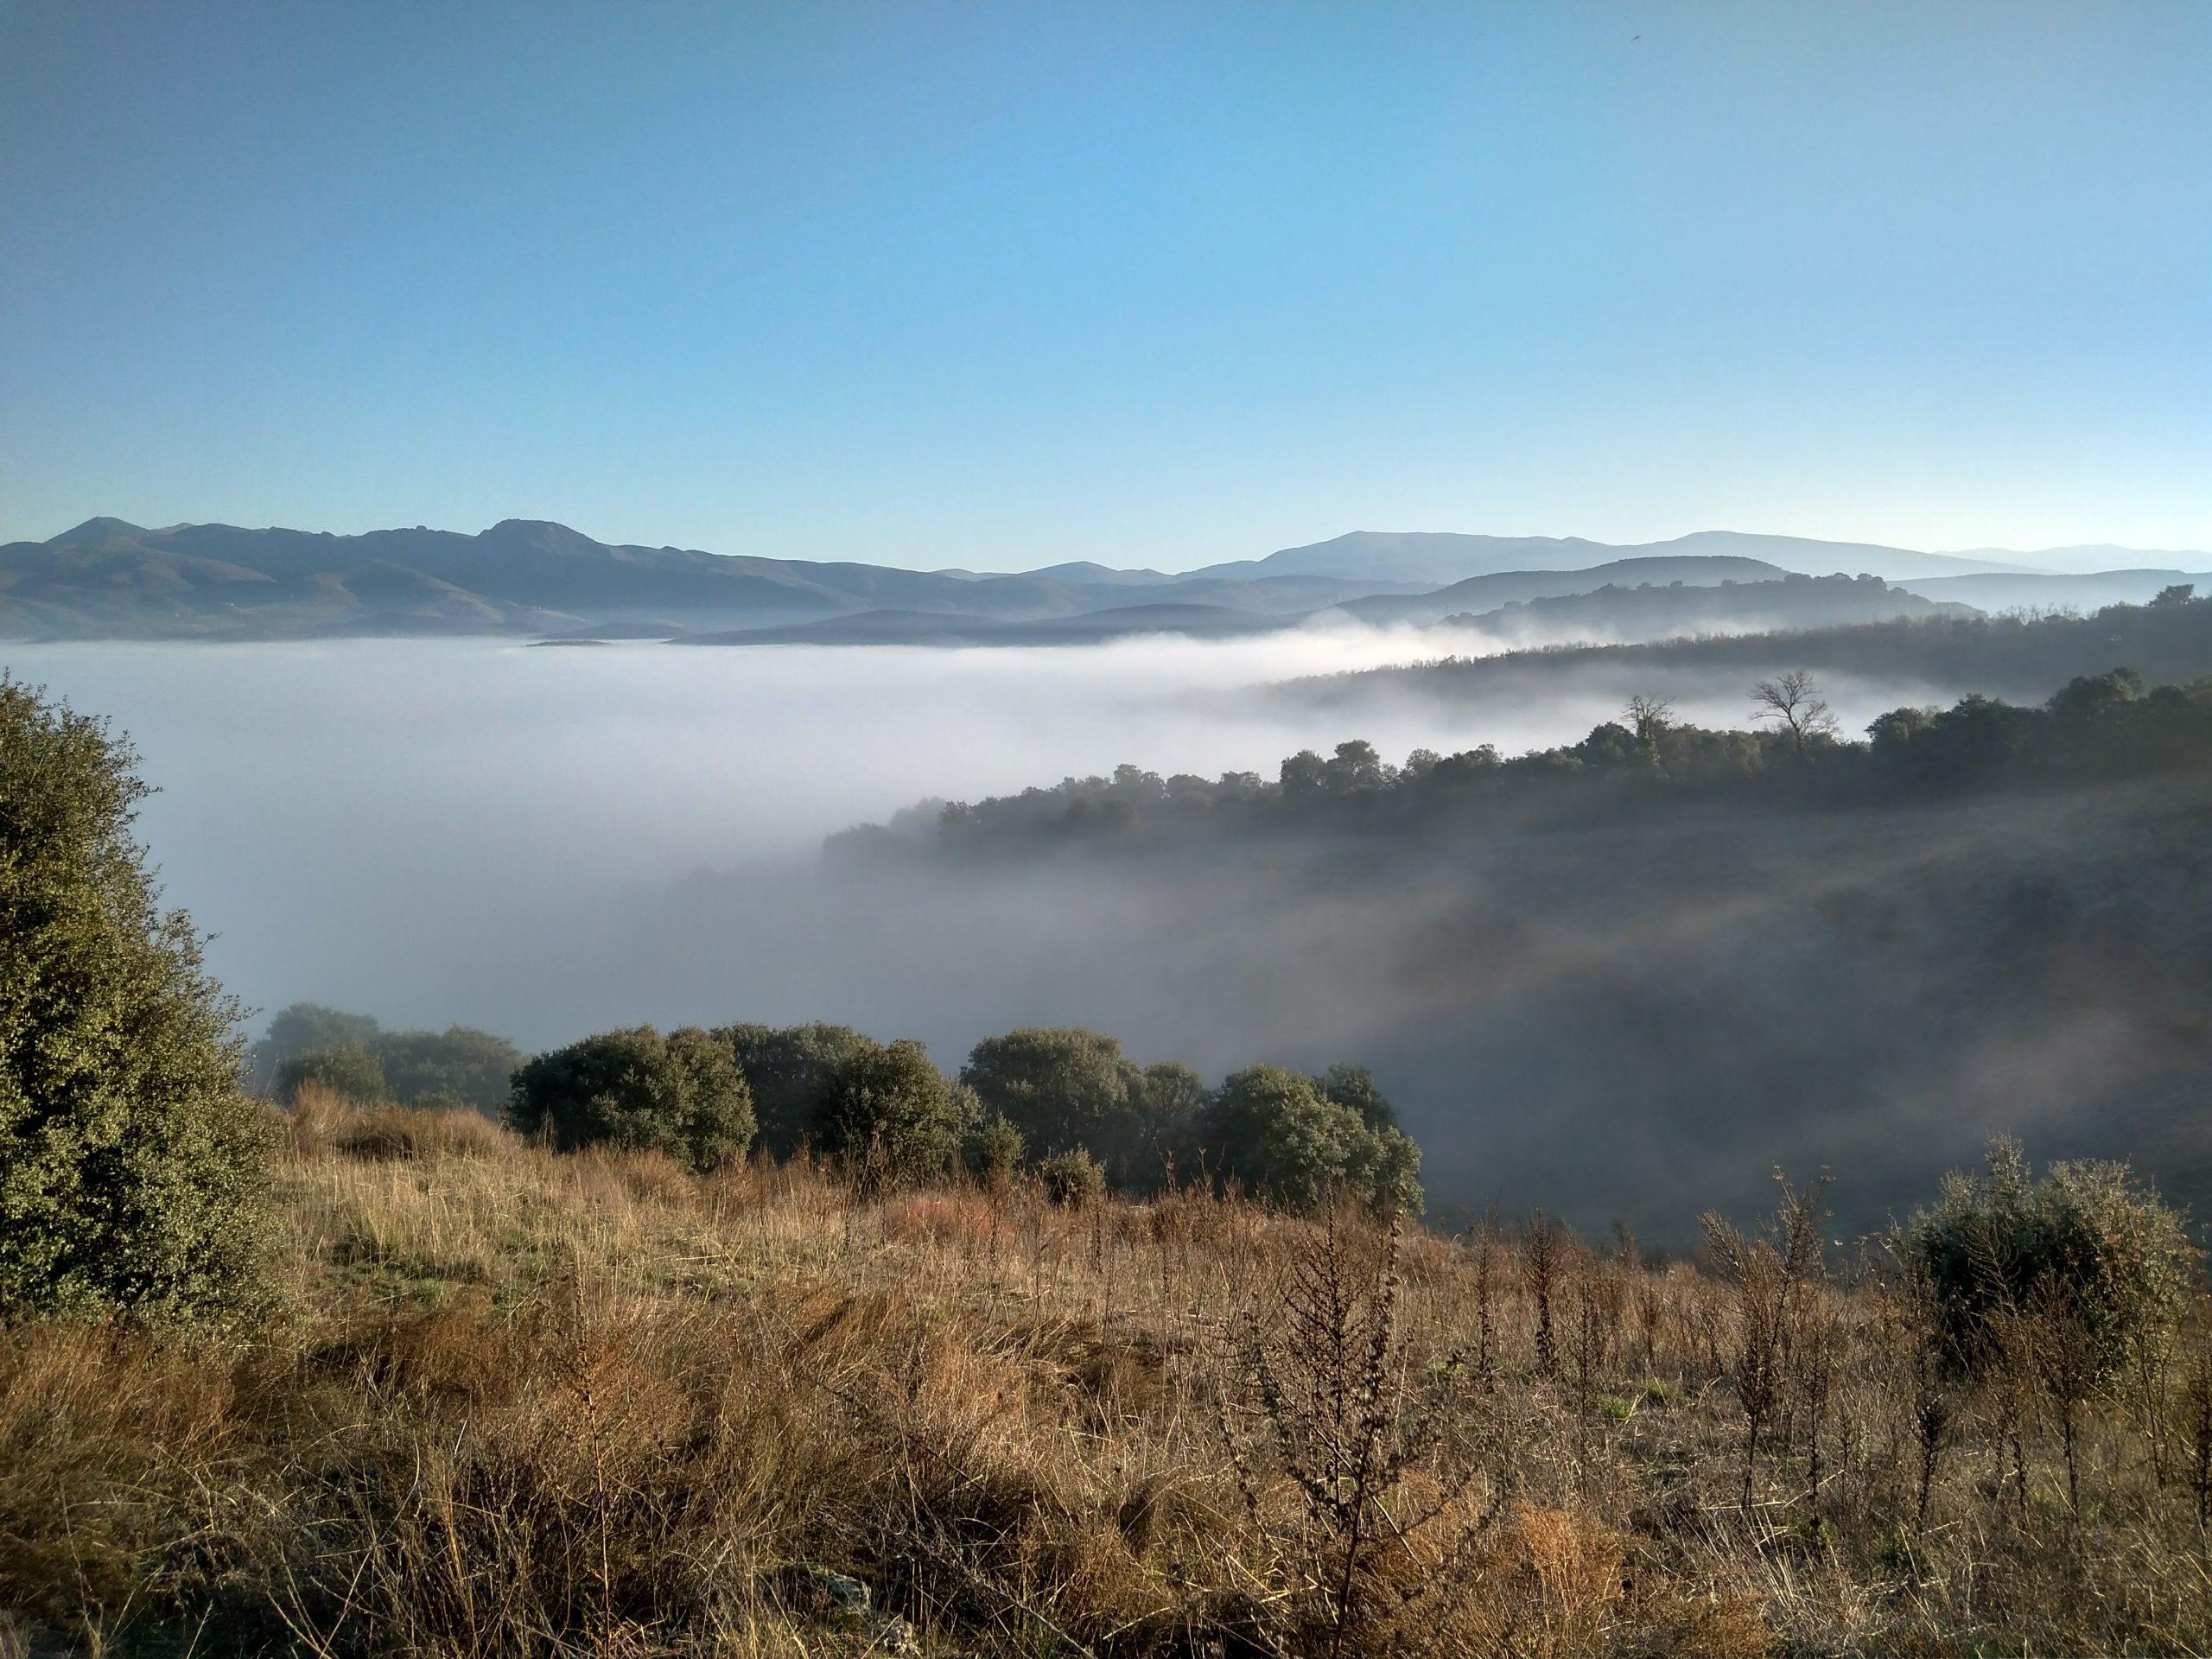 Bodega Y Vinedos Hija De Anibal Point of View Clouds